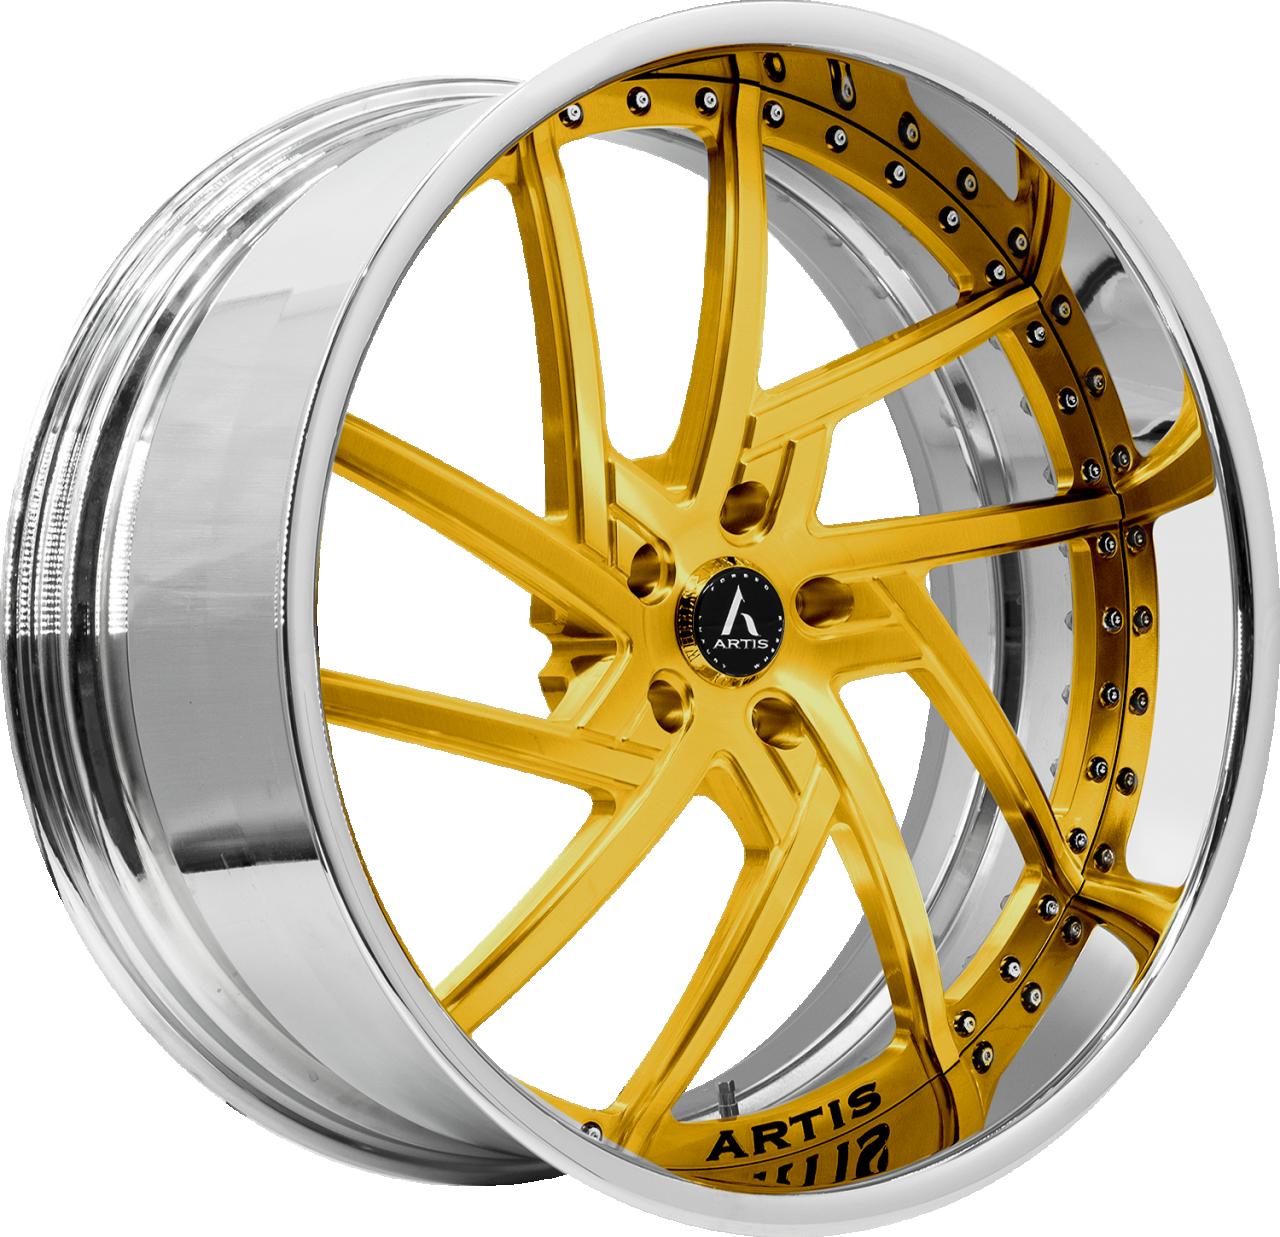 Artis Forged Fairfax wheel with Custom Gold finish